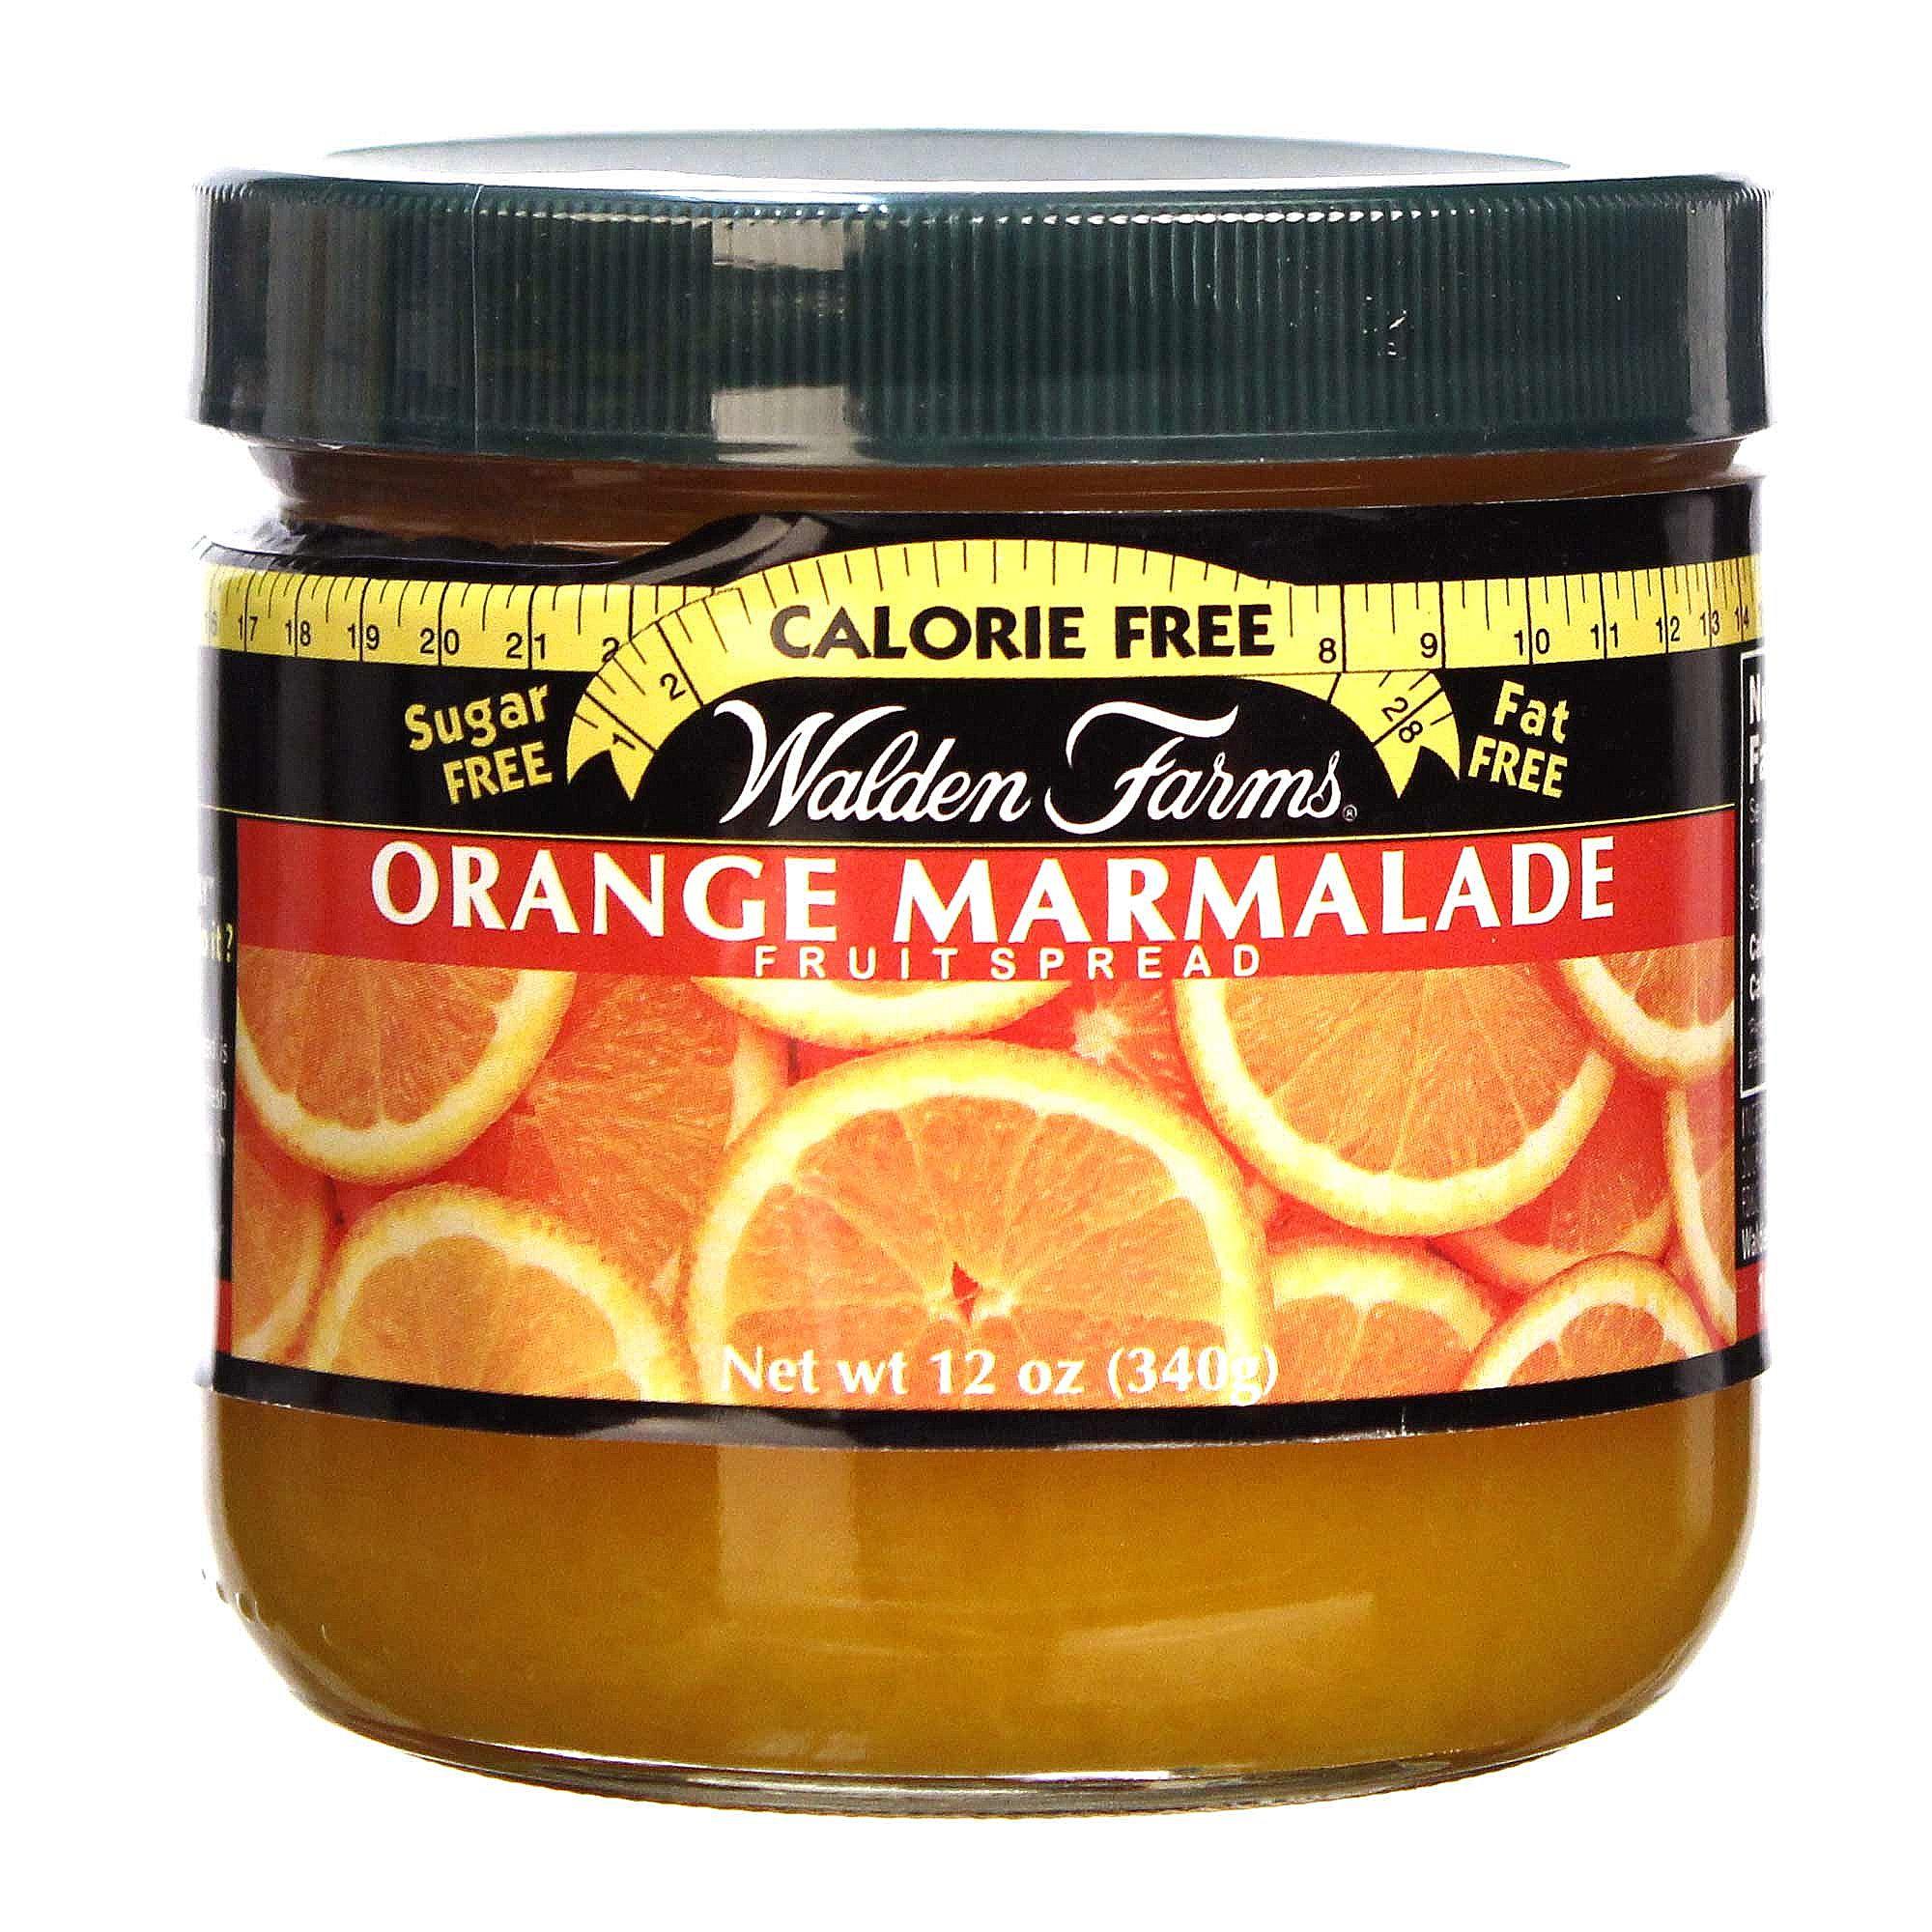 walden farms orange marmalade fruit spread 12 oz. Black Bedroom Furniture Sets. Home Design Ideas